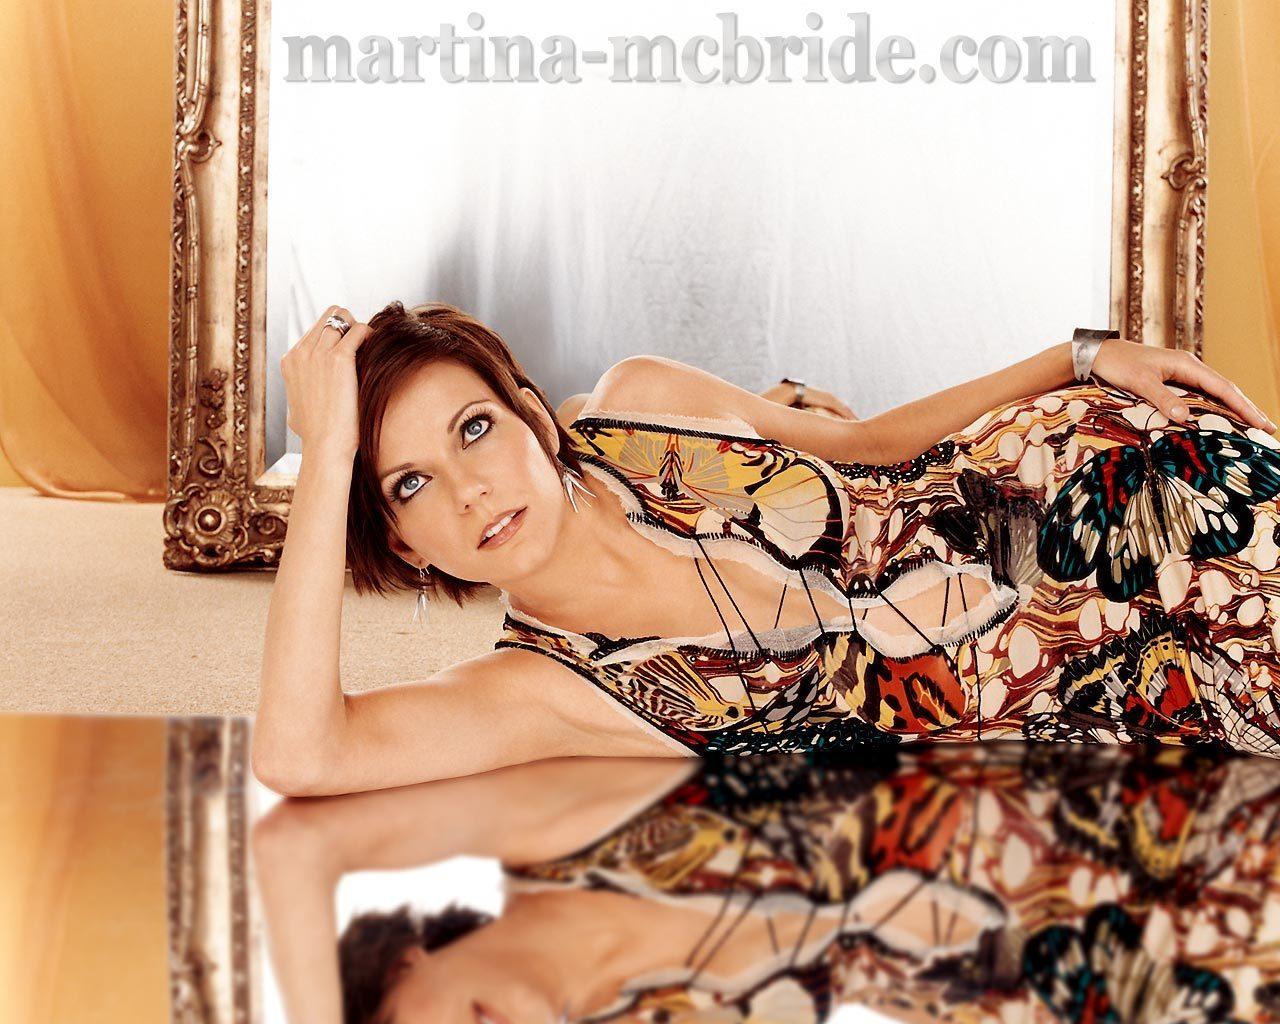 Martina McBride Wallpaper   Country Music Wallpaper 10596336 1280x1024